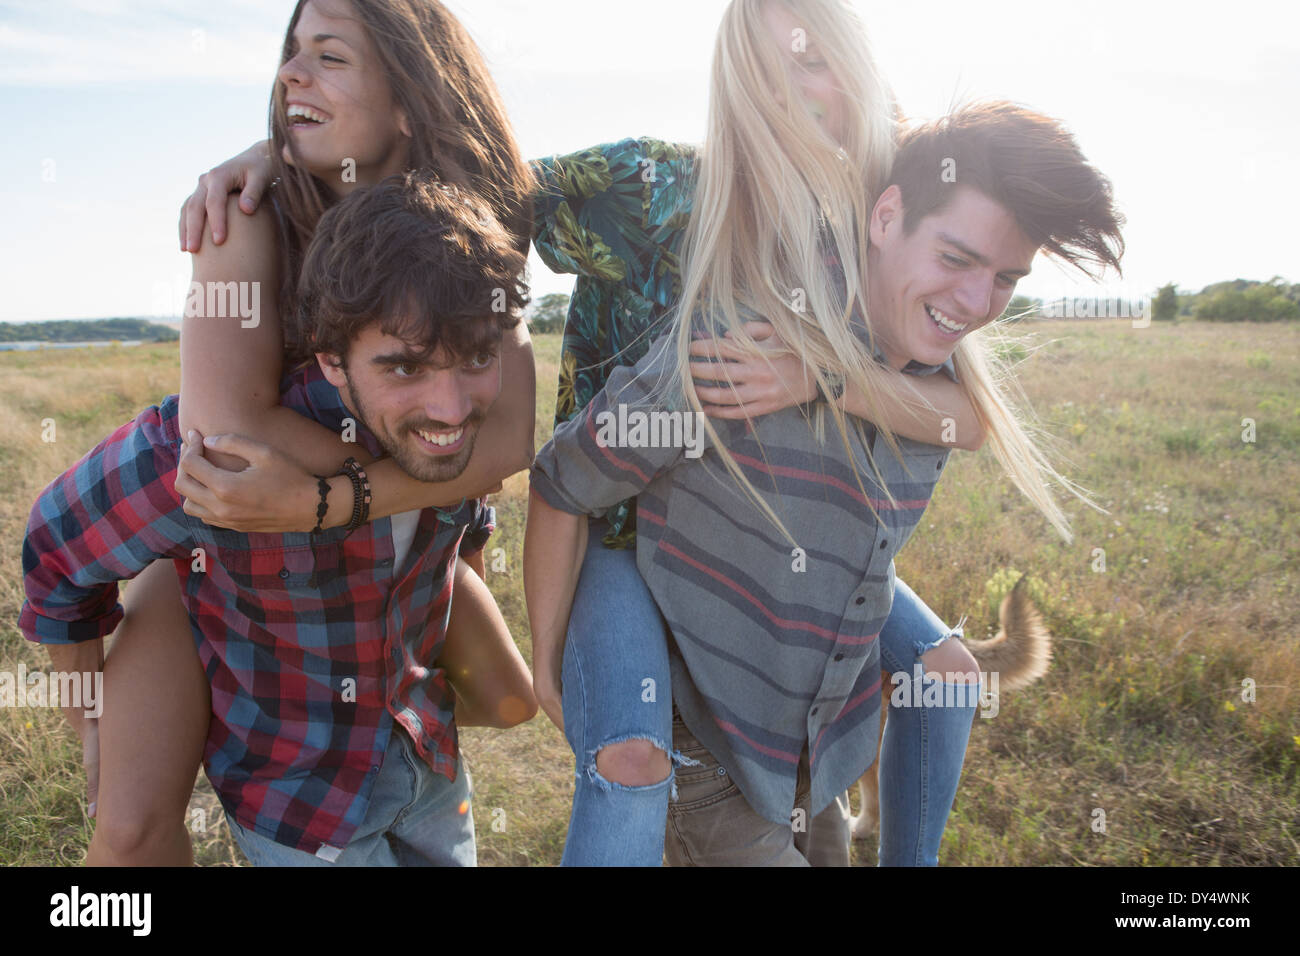 Young men giving women piggy backs - Stock Image